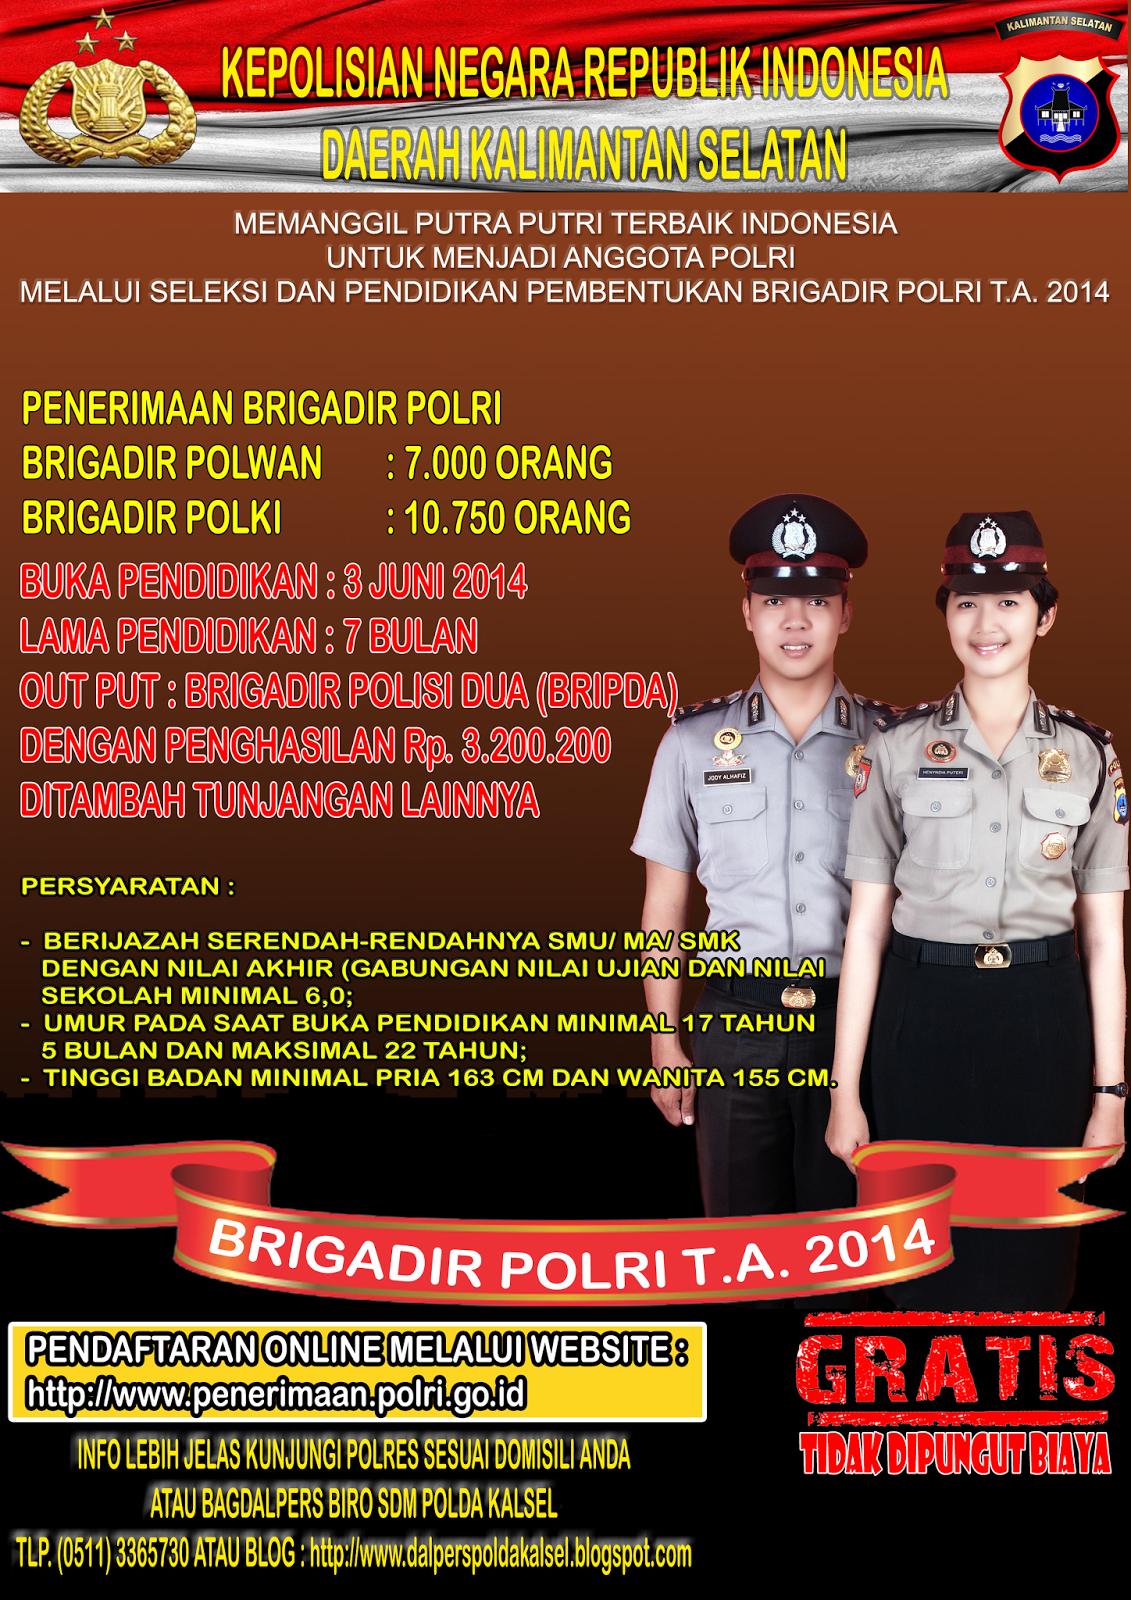 http://www.bidhumaspoldakalsel.com/2014/03/penerimaan-brigadir-polri-ta2014-polda.html